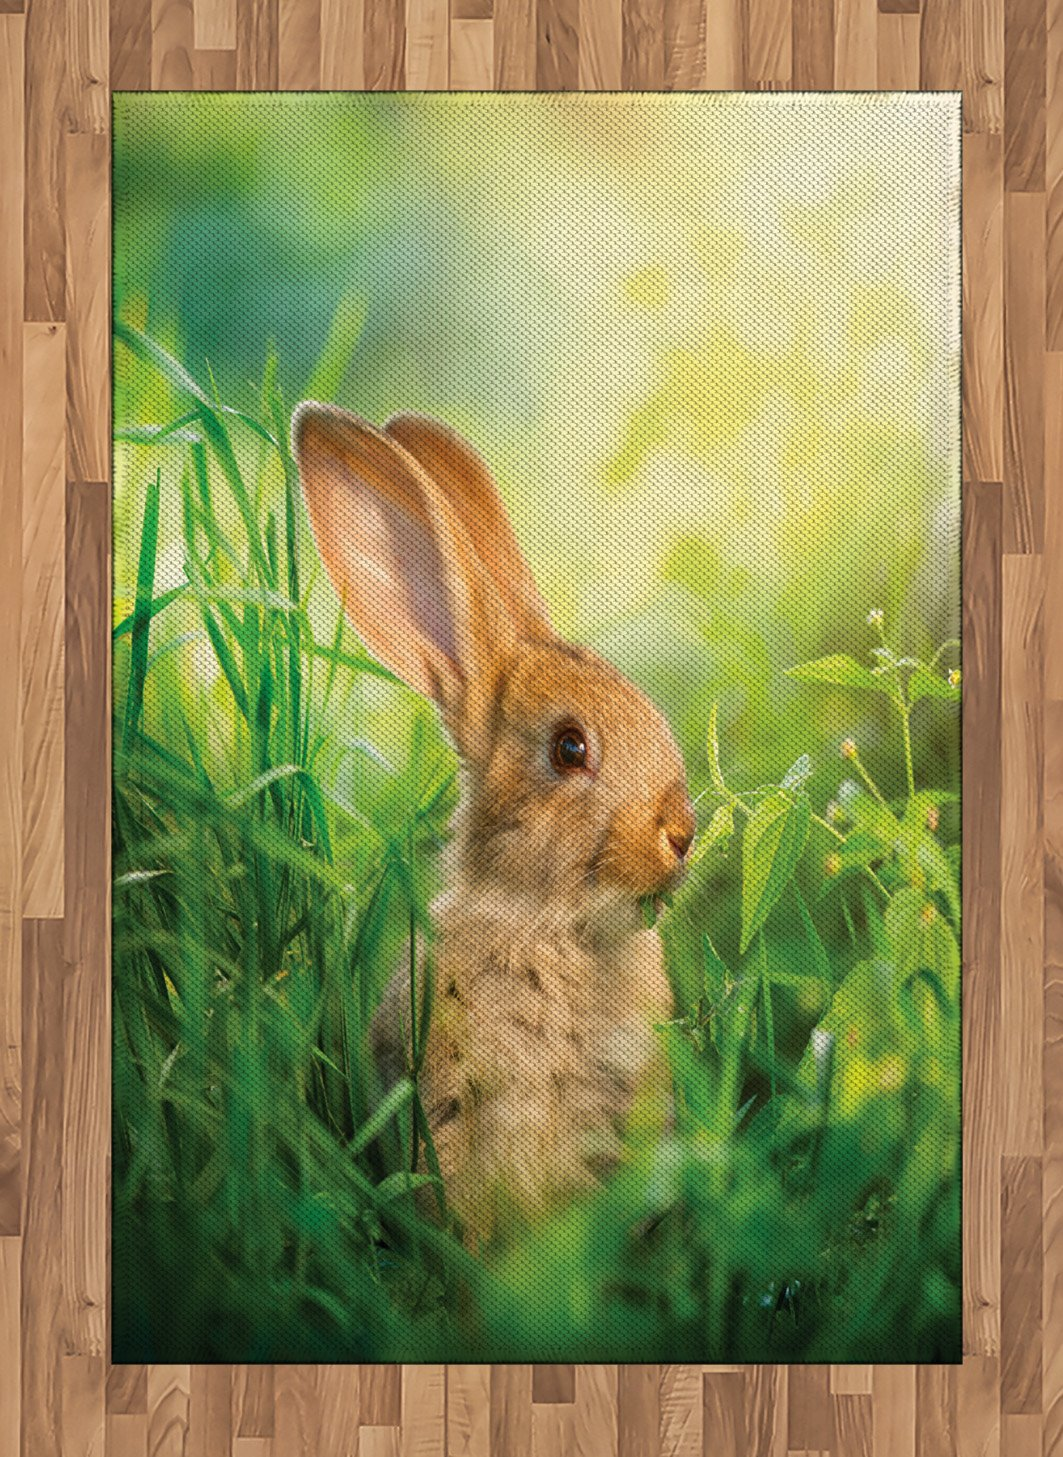 Amazon com: Lunarable Rabbit Area Rug, Rabbit in a Meadow Among